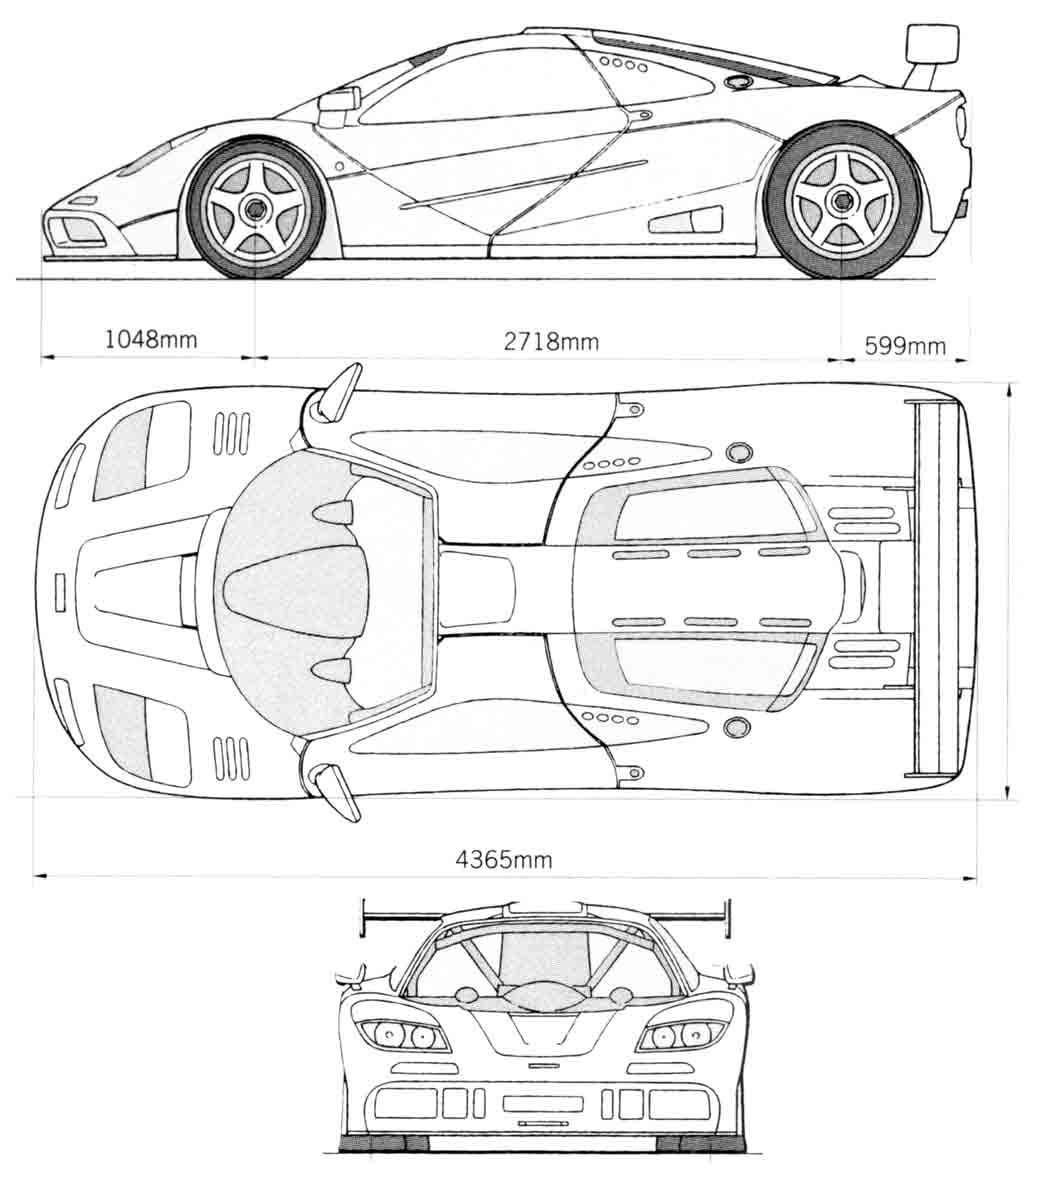 The Mercedes SLR McLaren | Pinterest | Mclaren f1, F1 and Cars